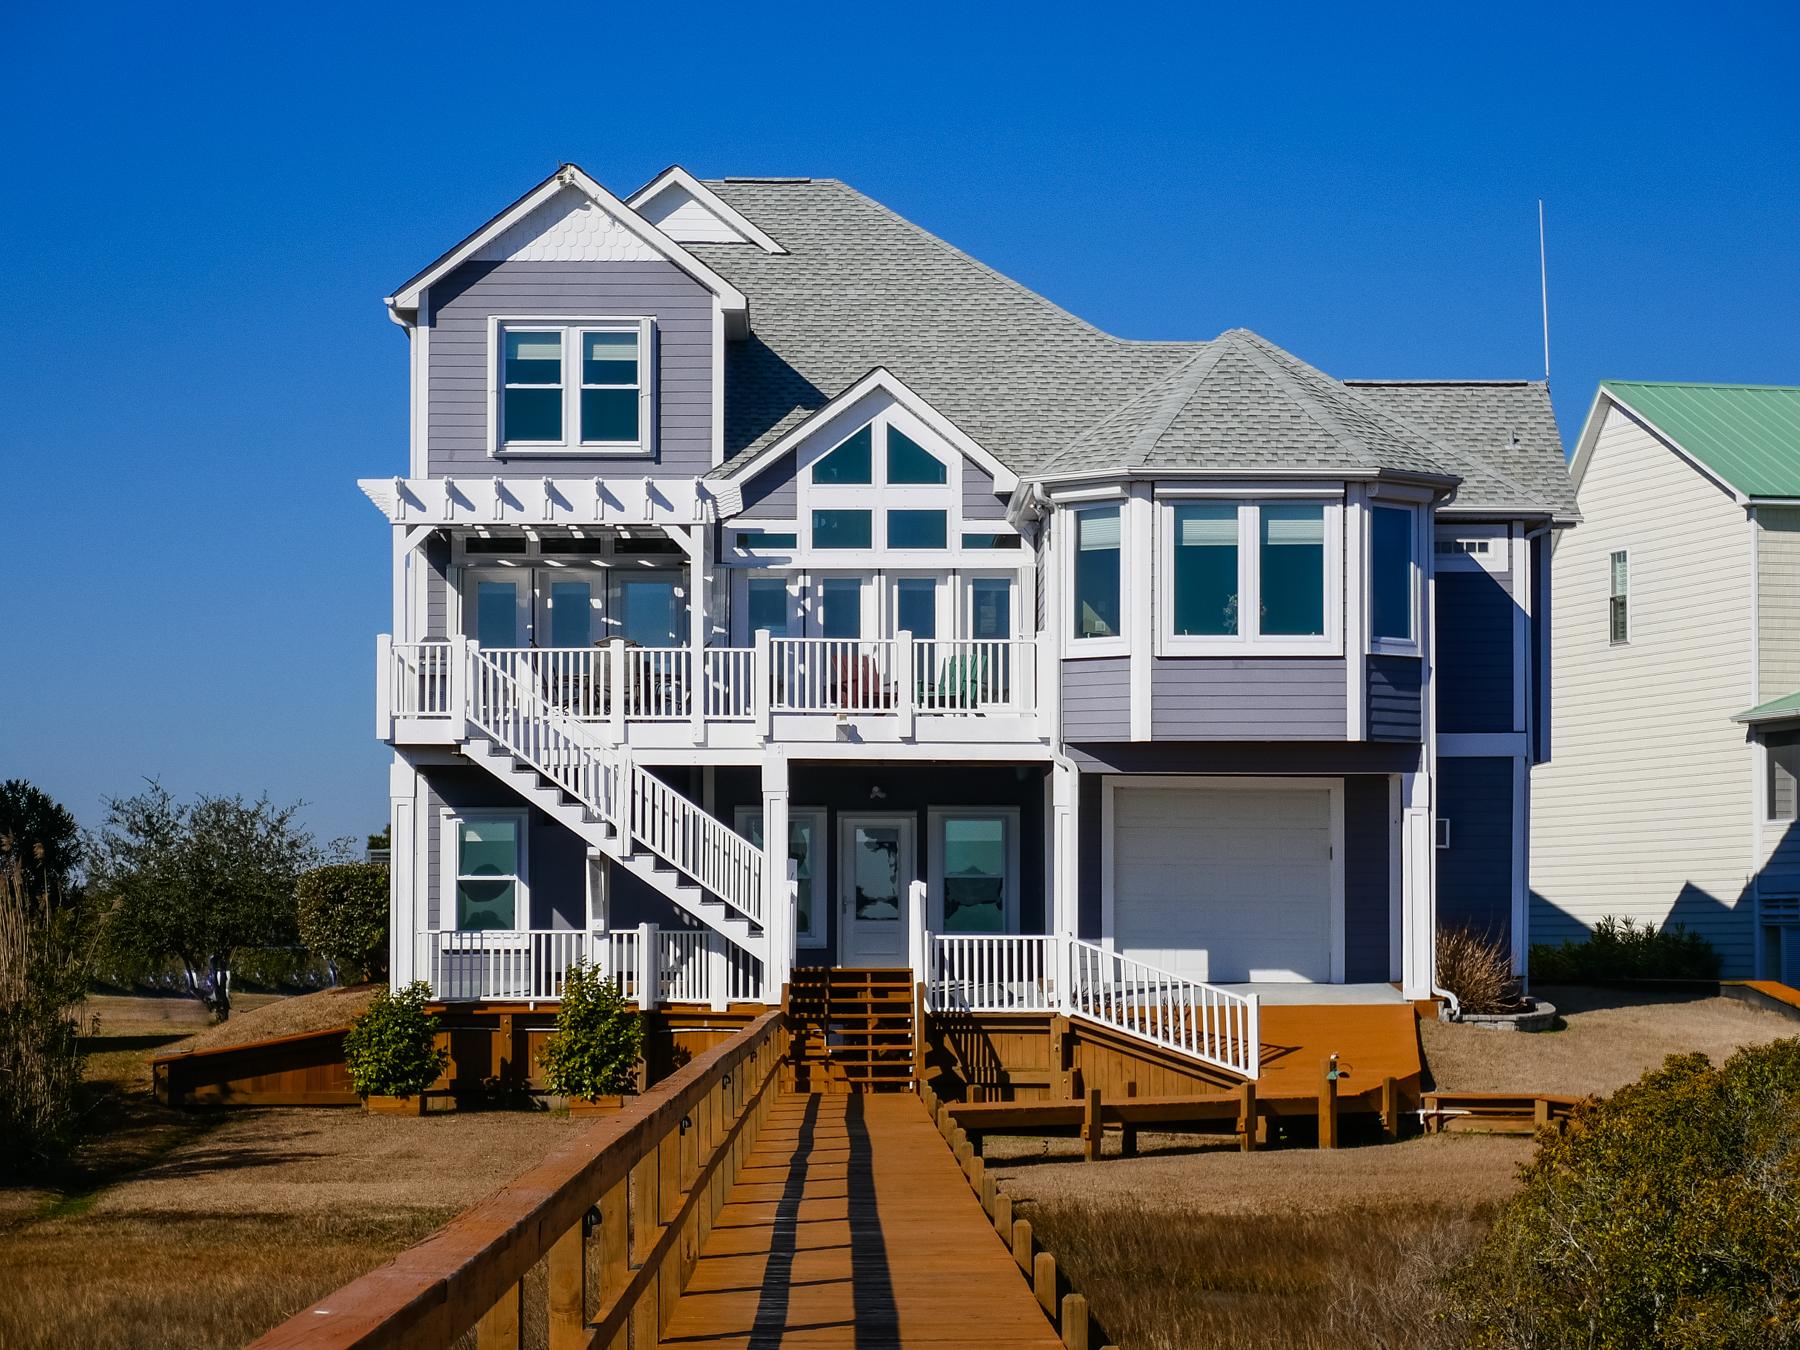 獨棟家庭住宅 為 出售 在 Spectacular Waterfront Cottage on the North Carolina Coast 172 Big Hammock Point Sneads Ferry, 北卡羅來納州 28460 美國